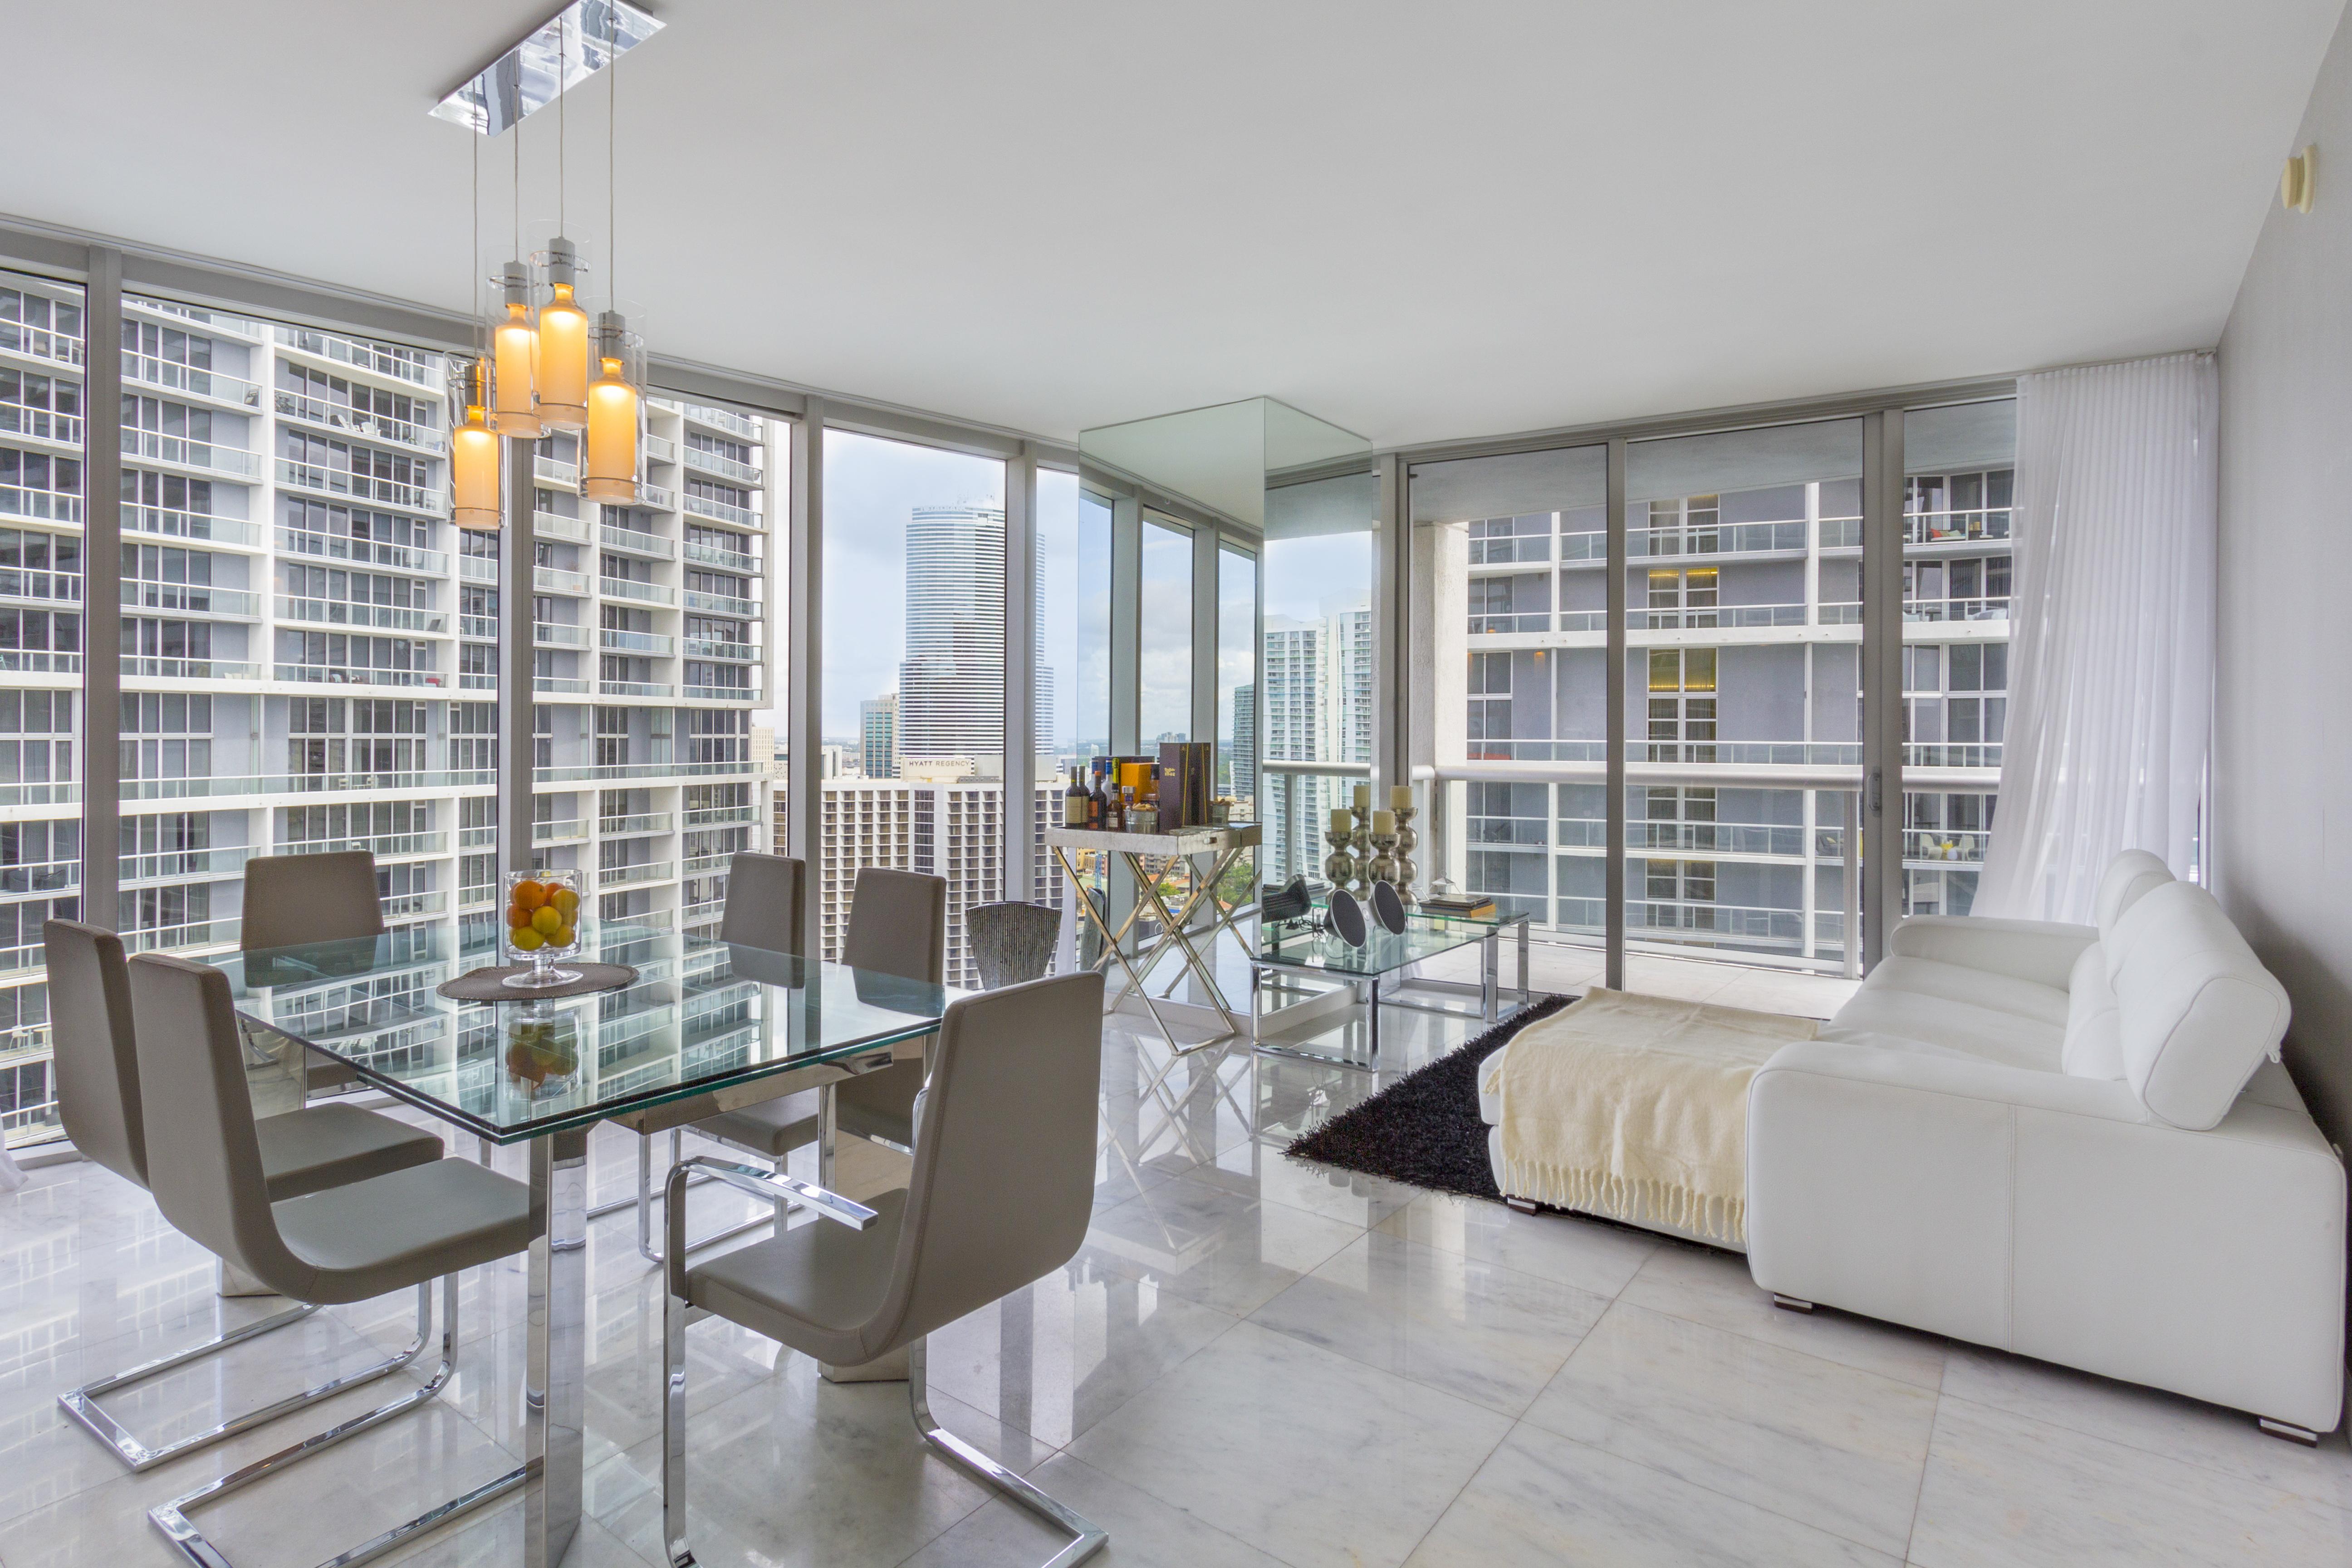 Condominium for Sale at 495 Brickell Ave # 2810 495 Brickell Ave 2810 Miami, Florida, 33131 United States